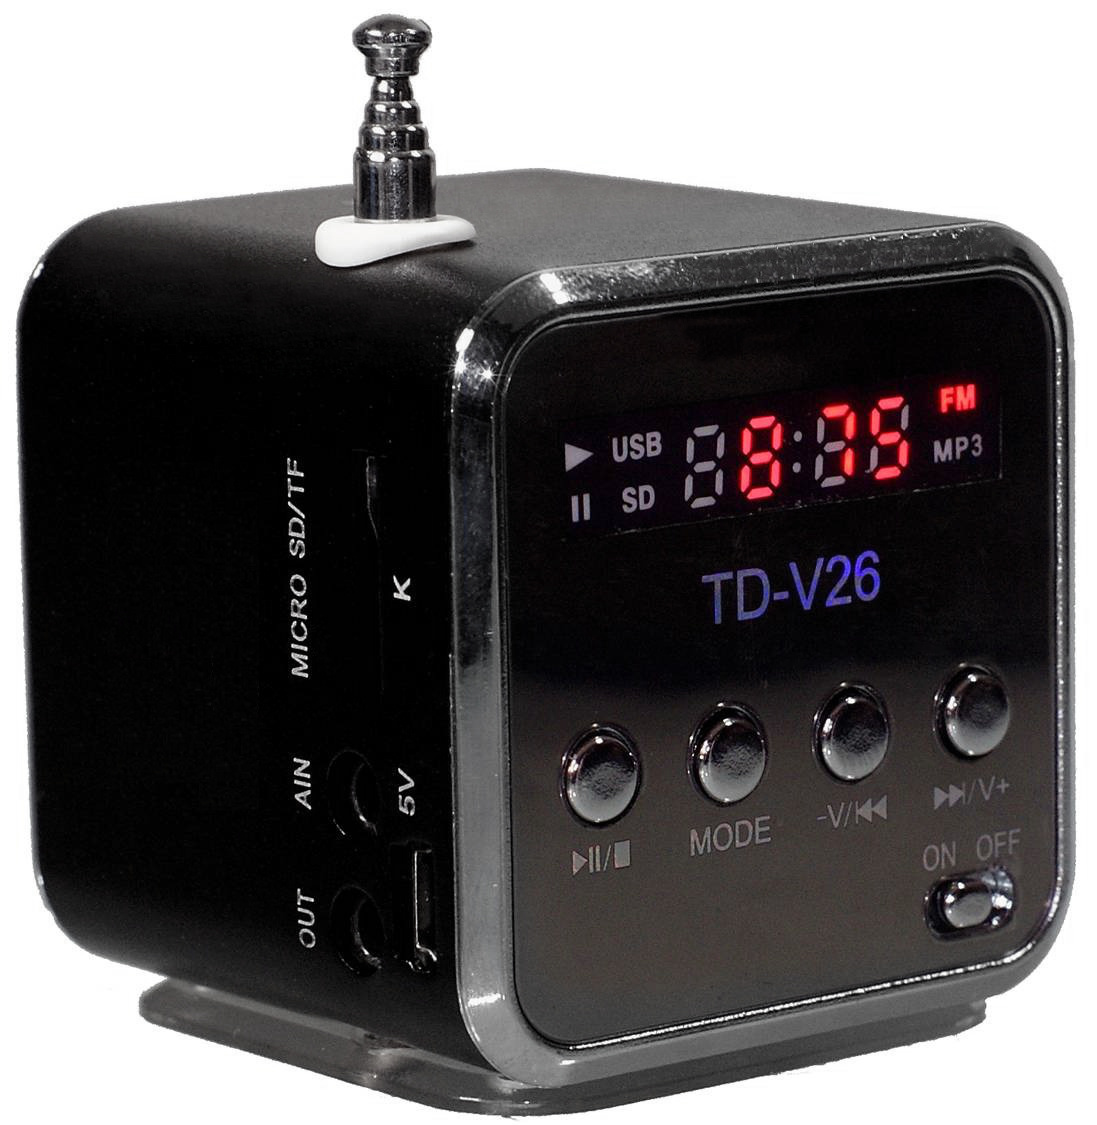 Mini reproduktor přehrávač MP3 USB radio TD-V26